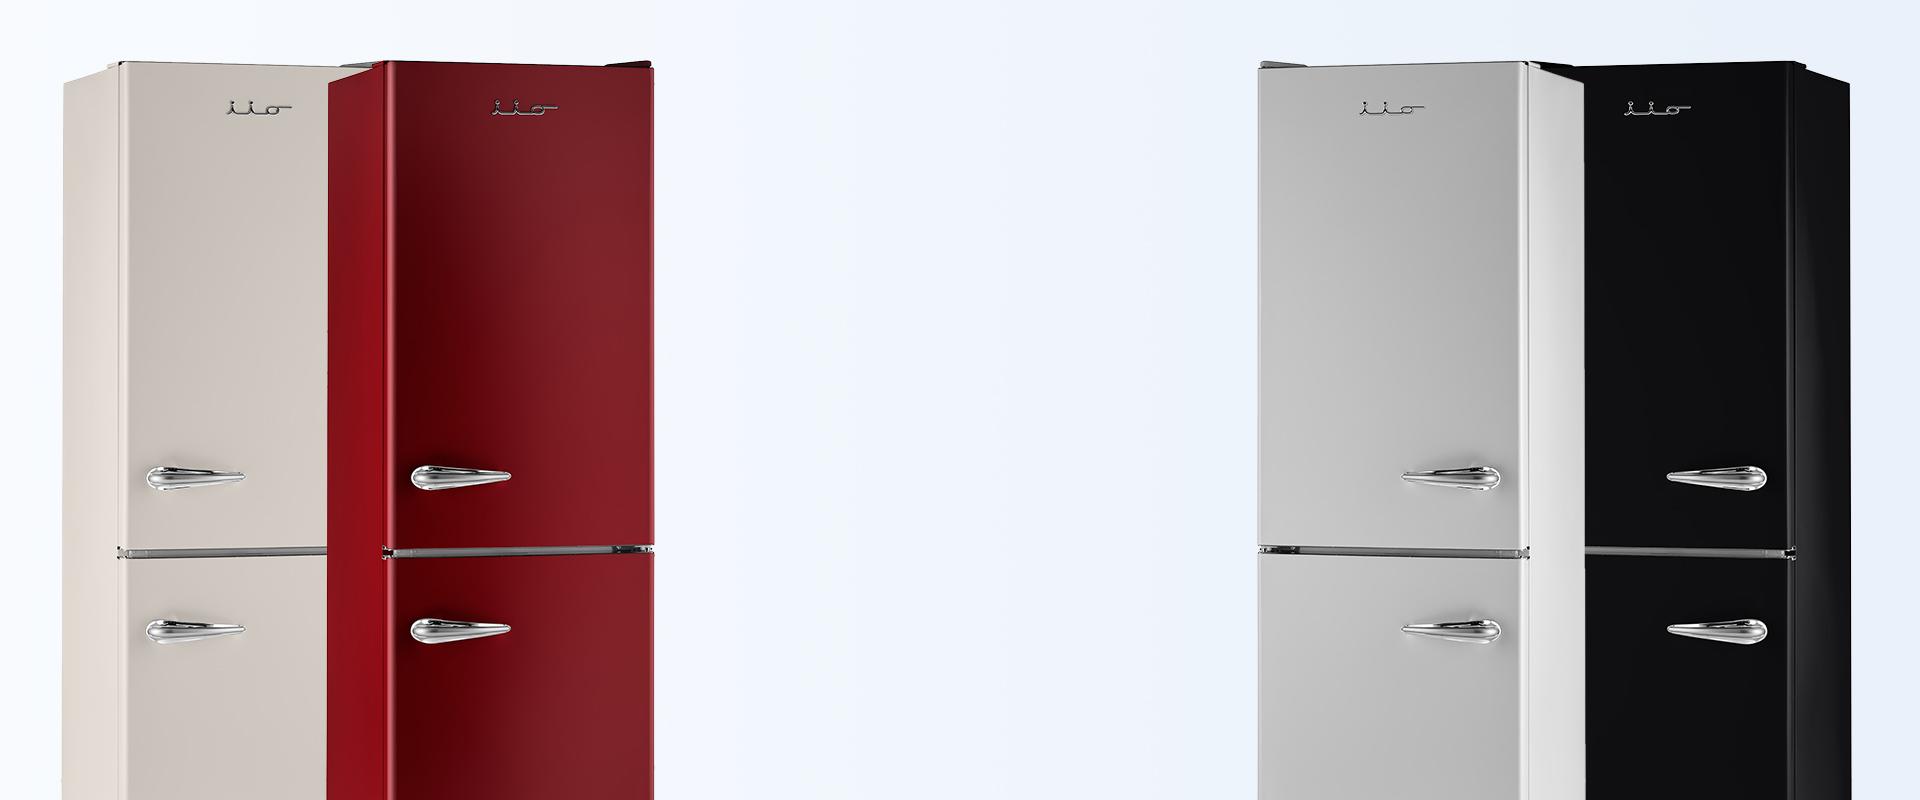 retro mod refrigerators for sale